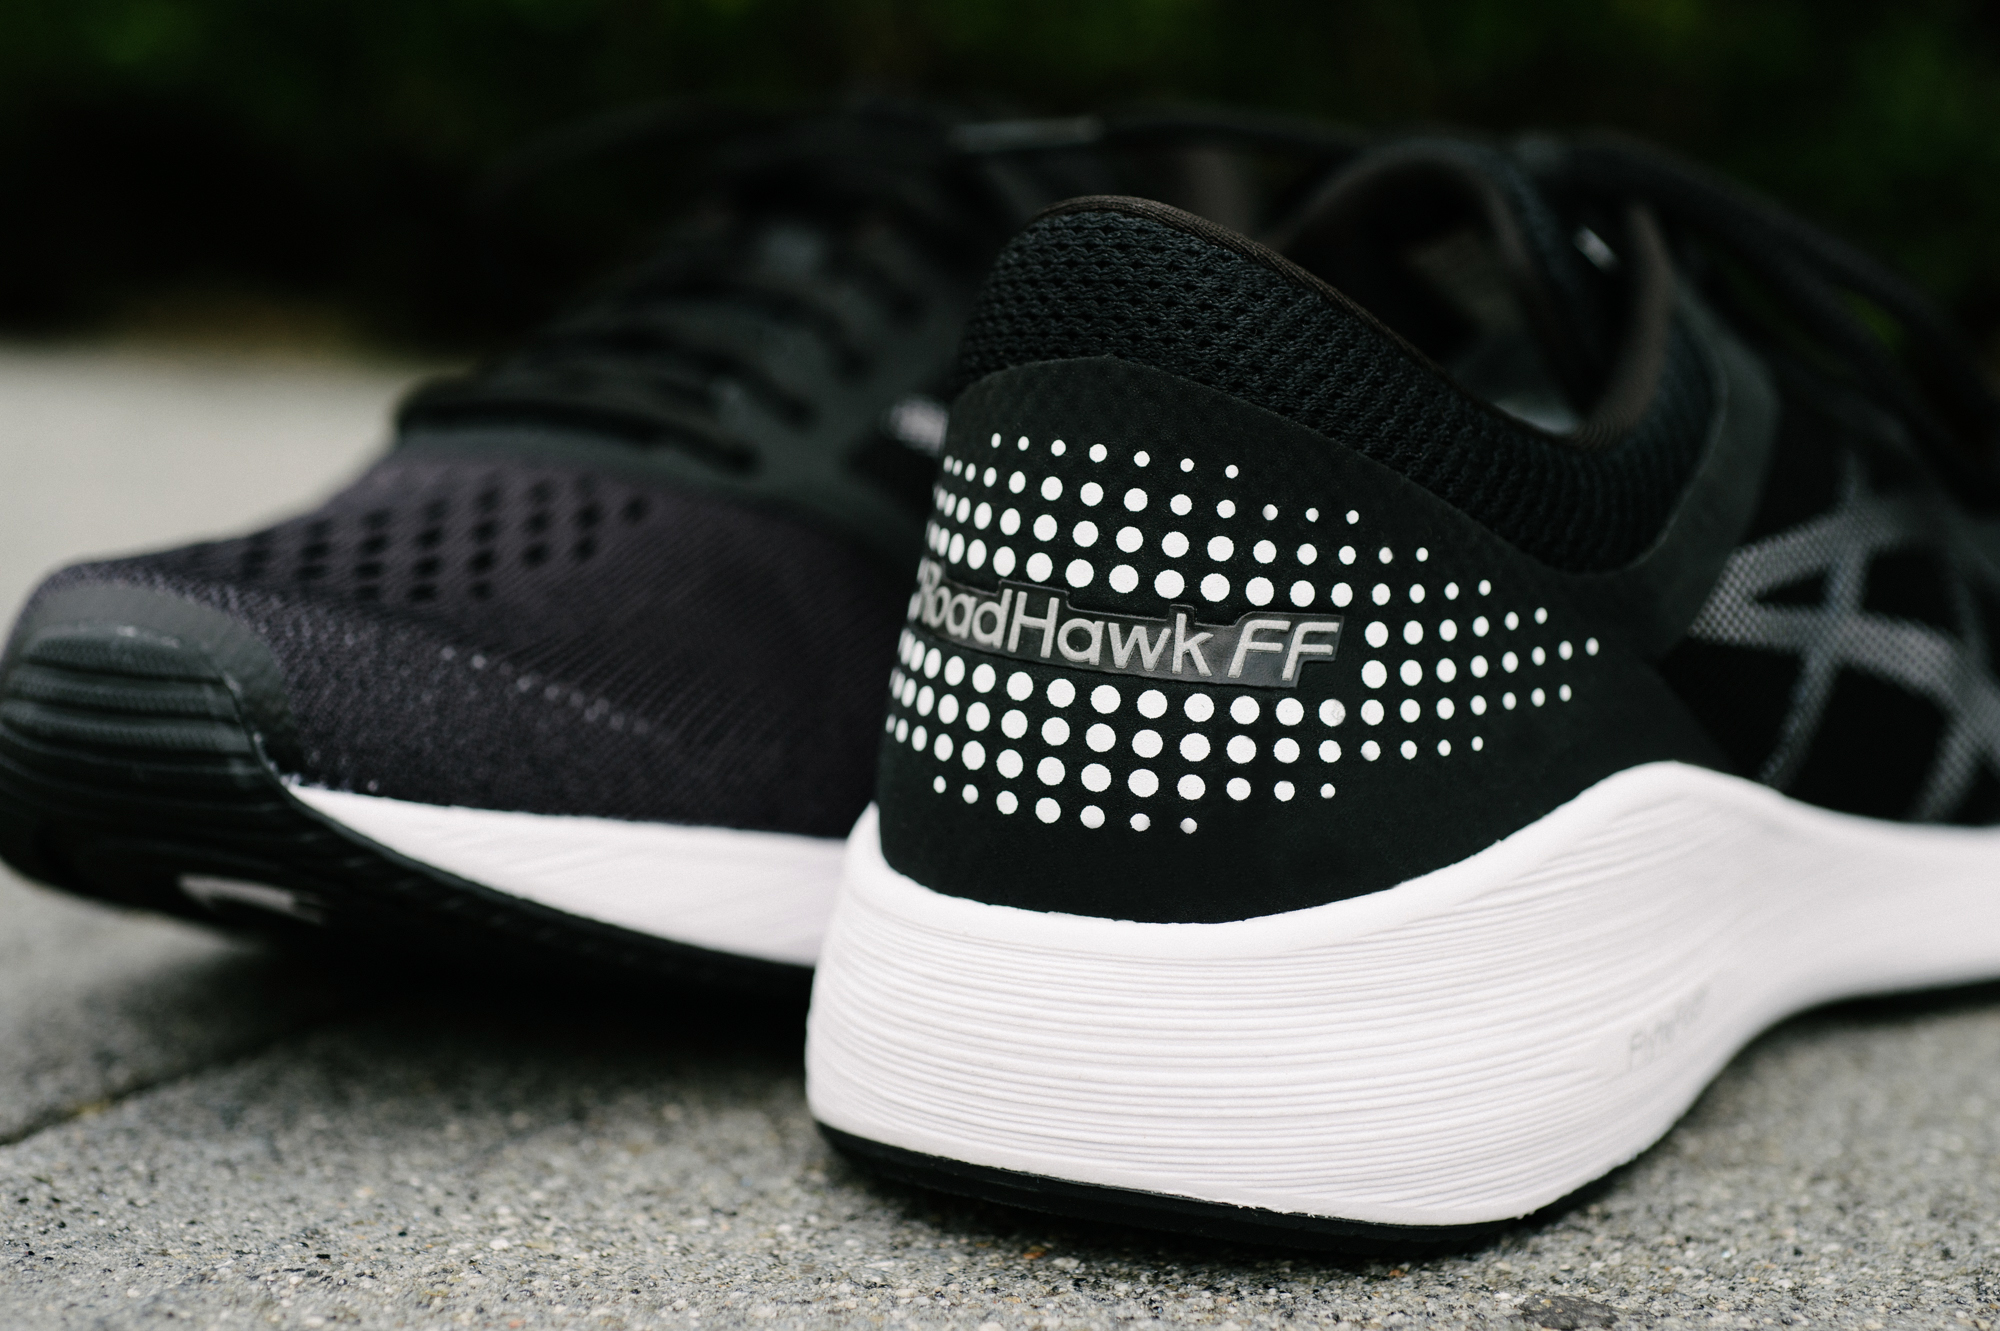 asics chaussure chaussette